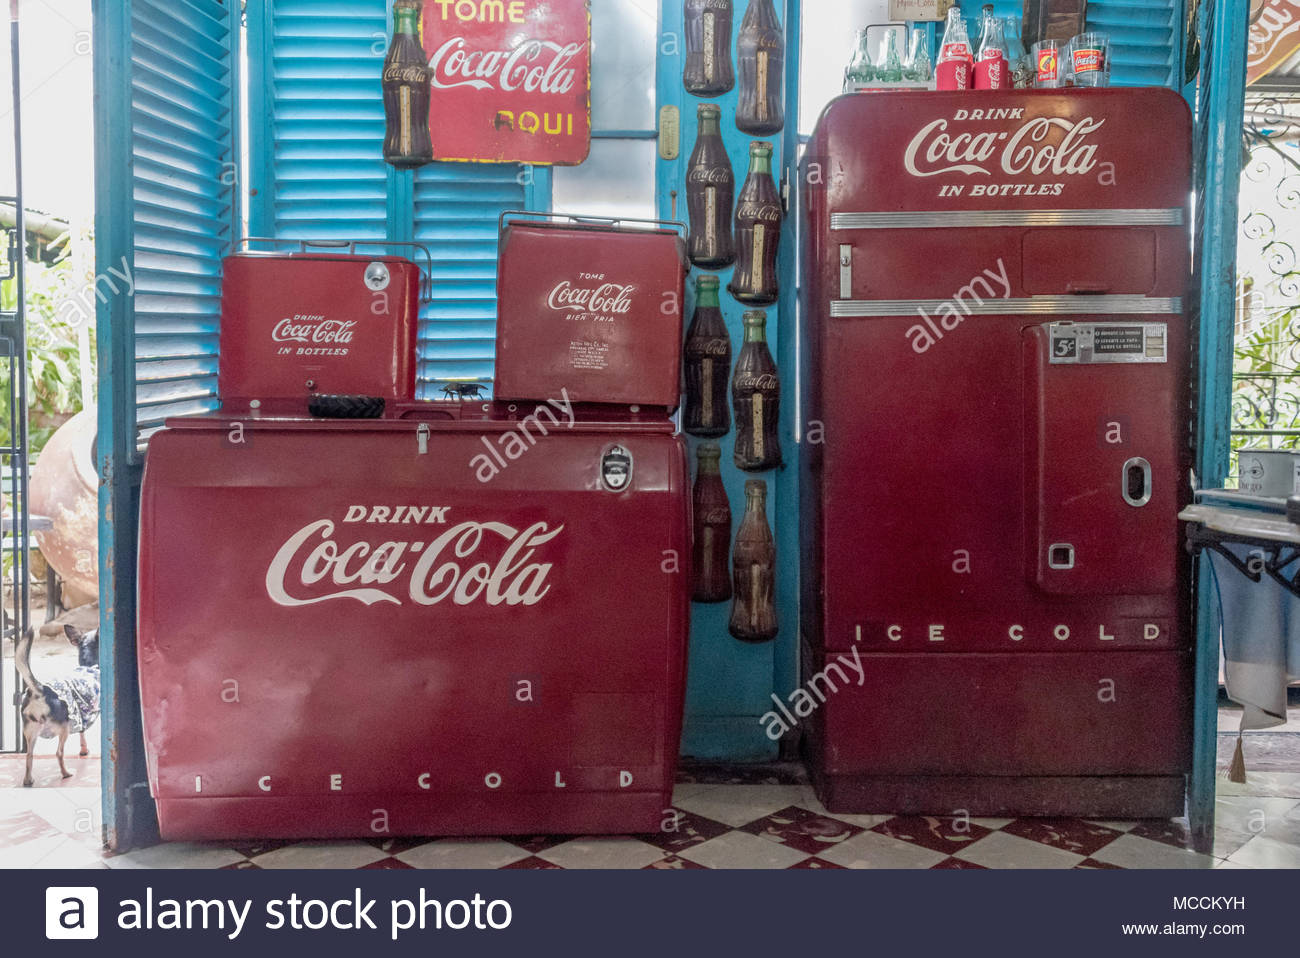 Kühlschrank Coco Cola : Alte coca cola kühlschrank bei ileana sanchez und joel jover haus